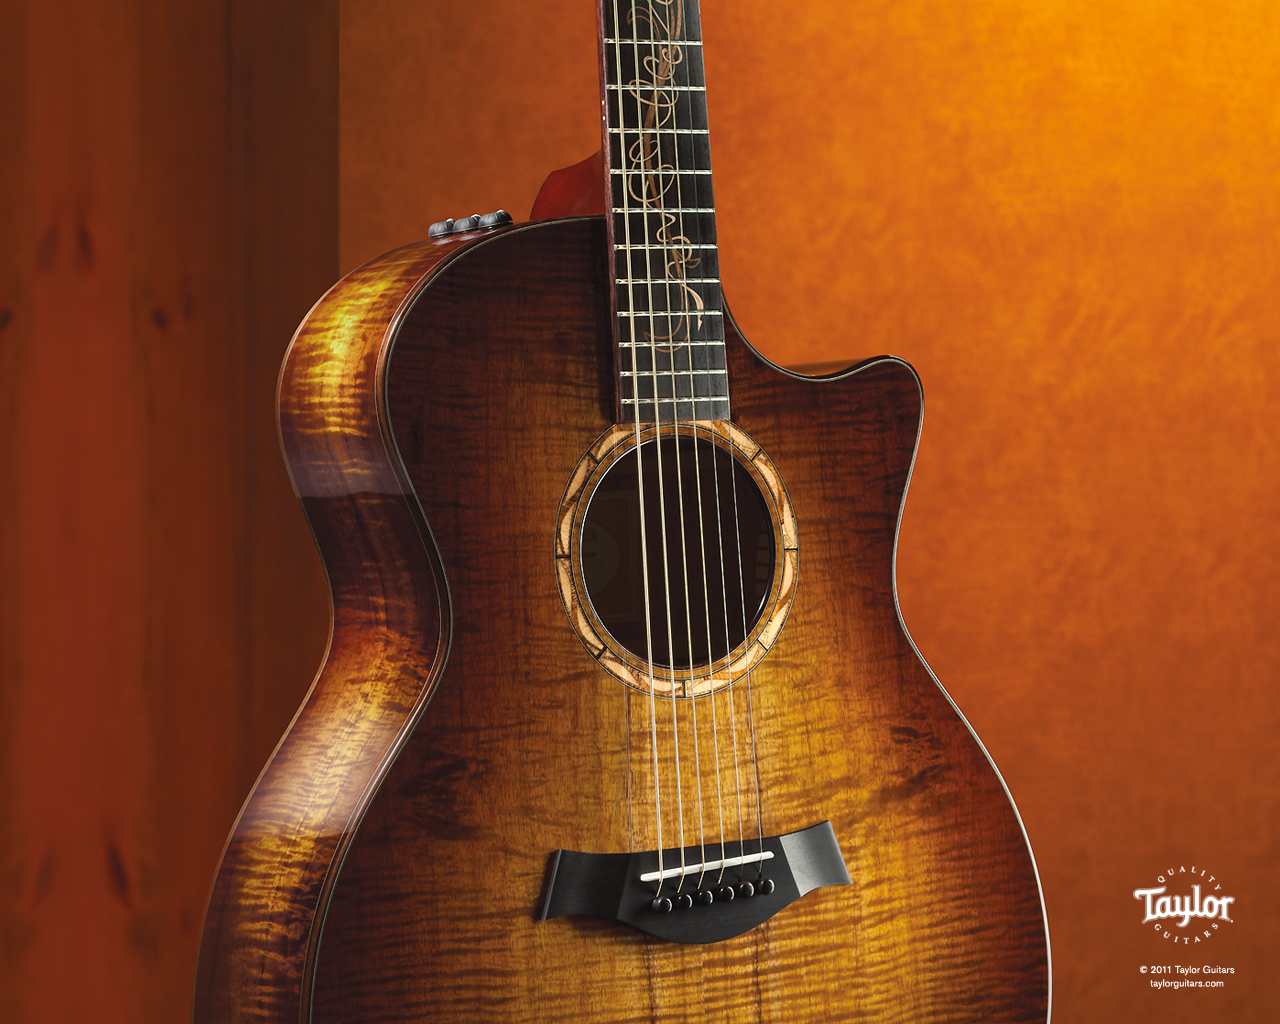 taylor guitars wallpapers - photo #6